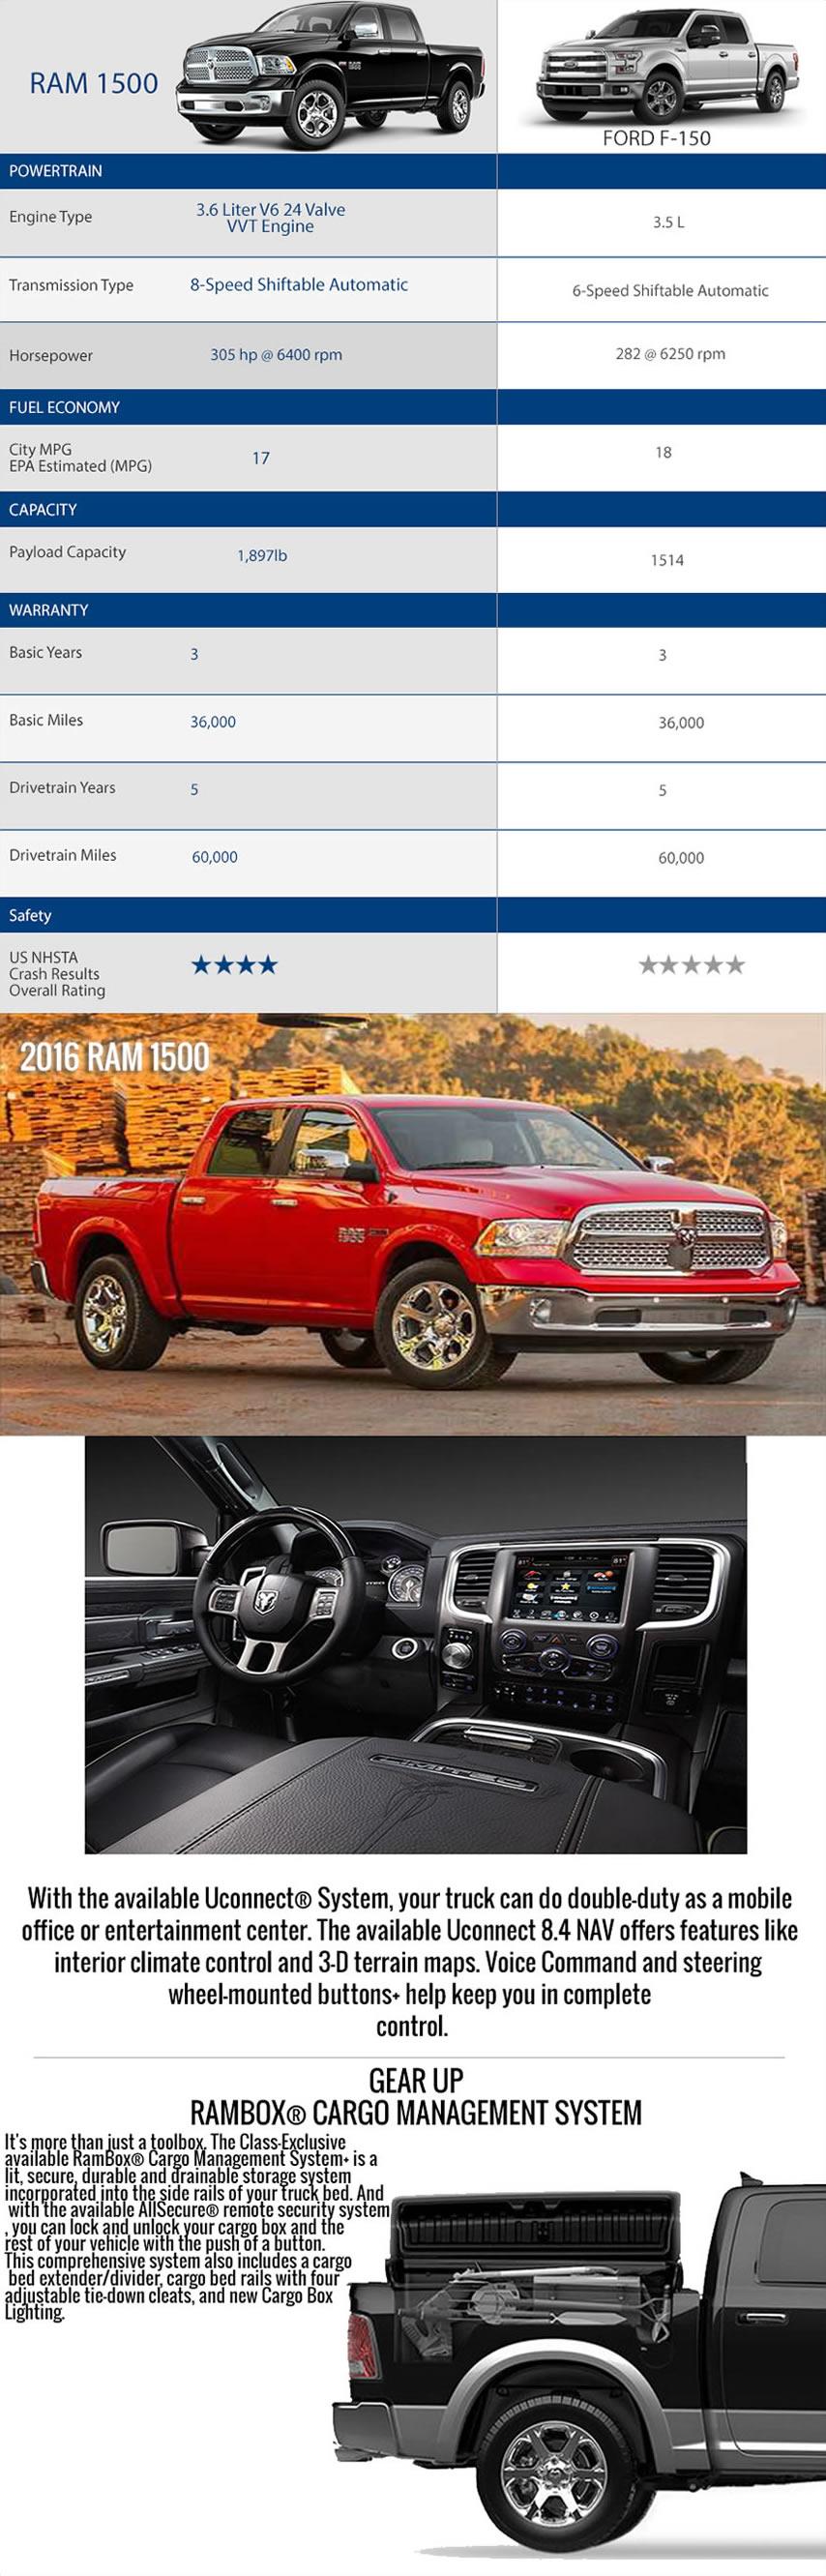 Ram1500-vs-Ford-F150-info